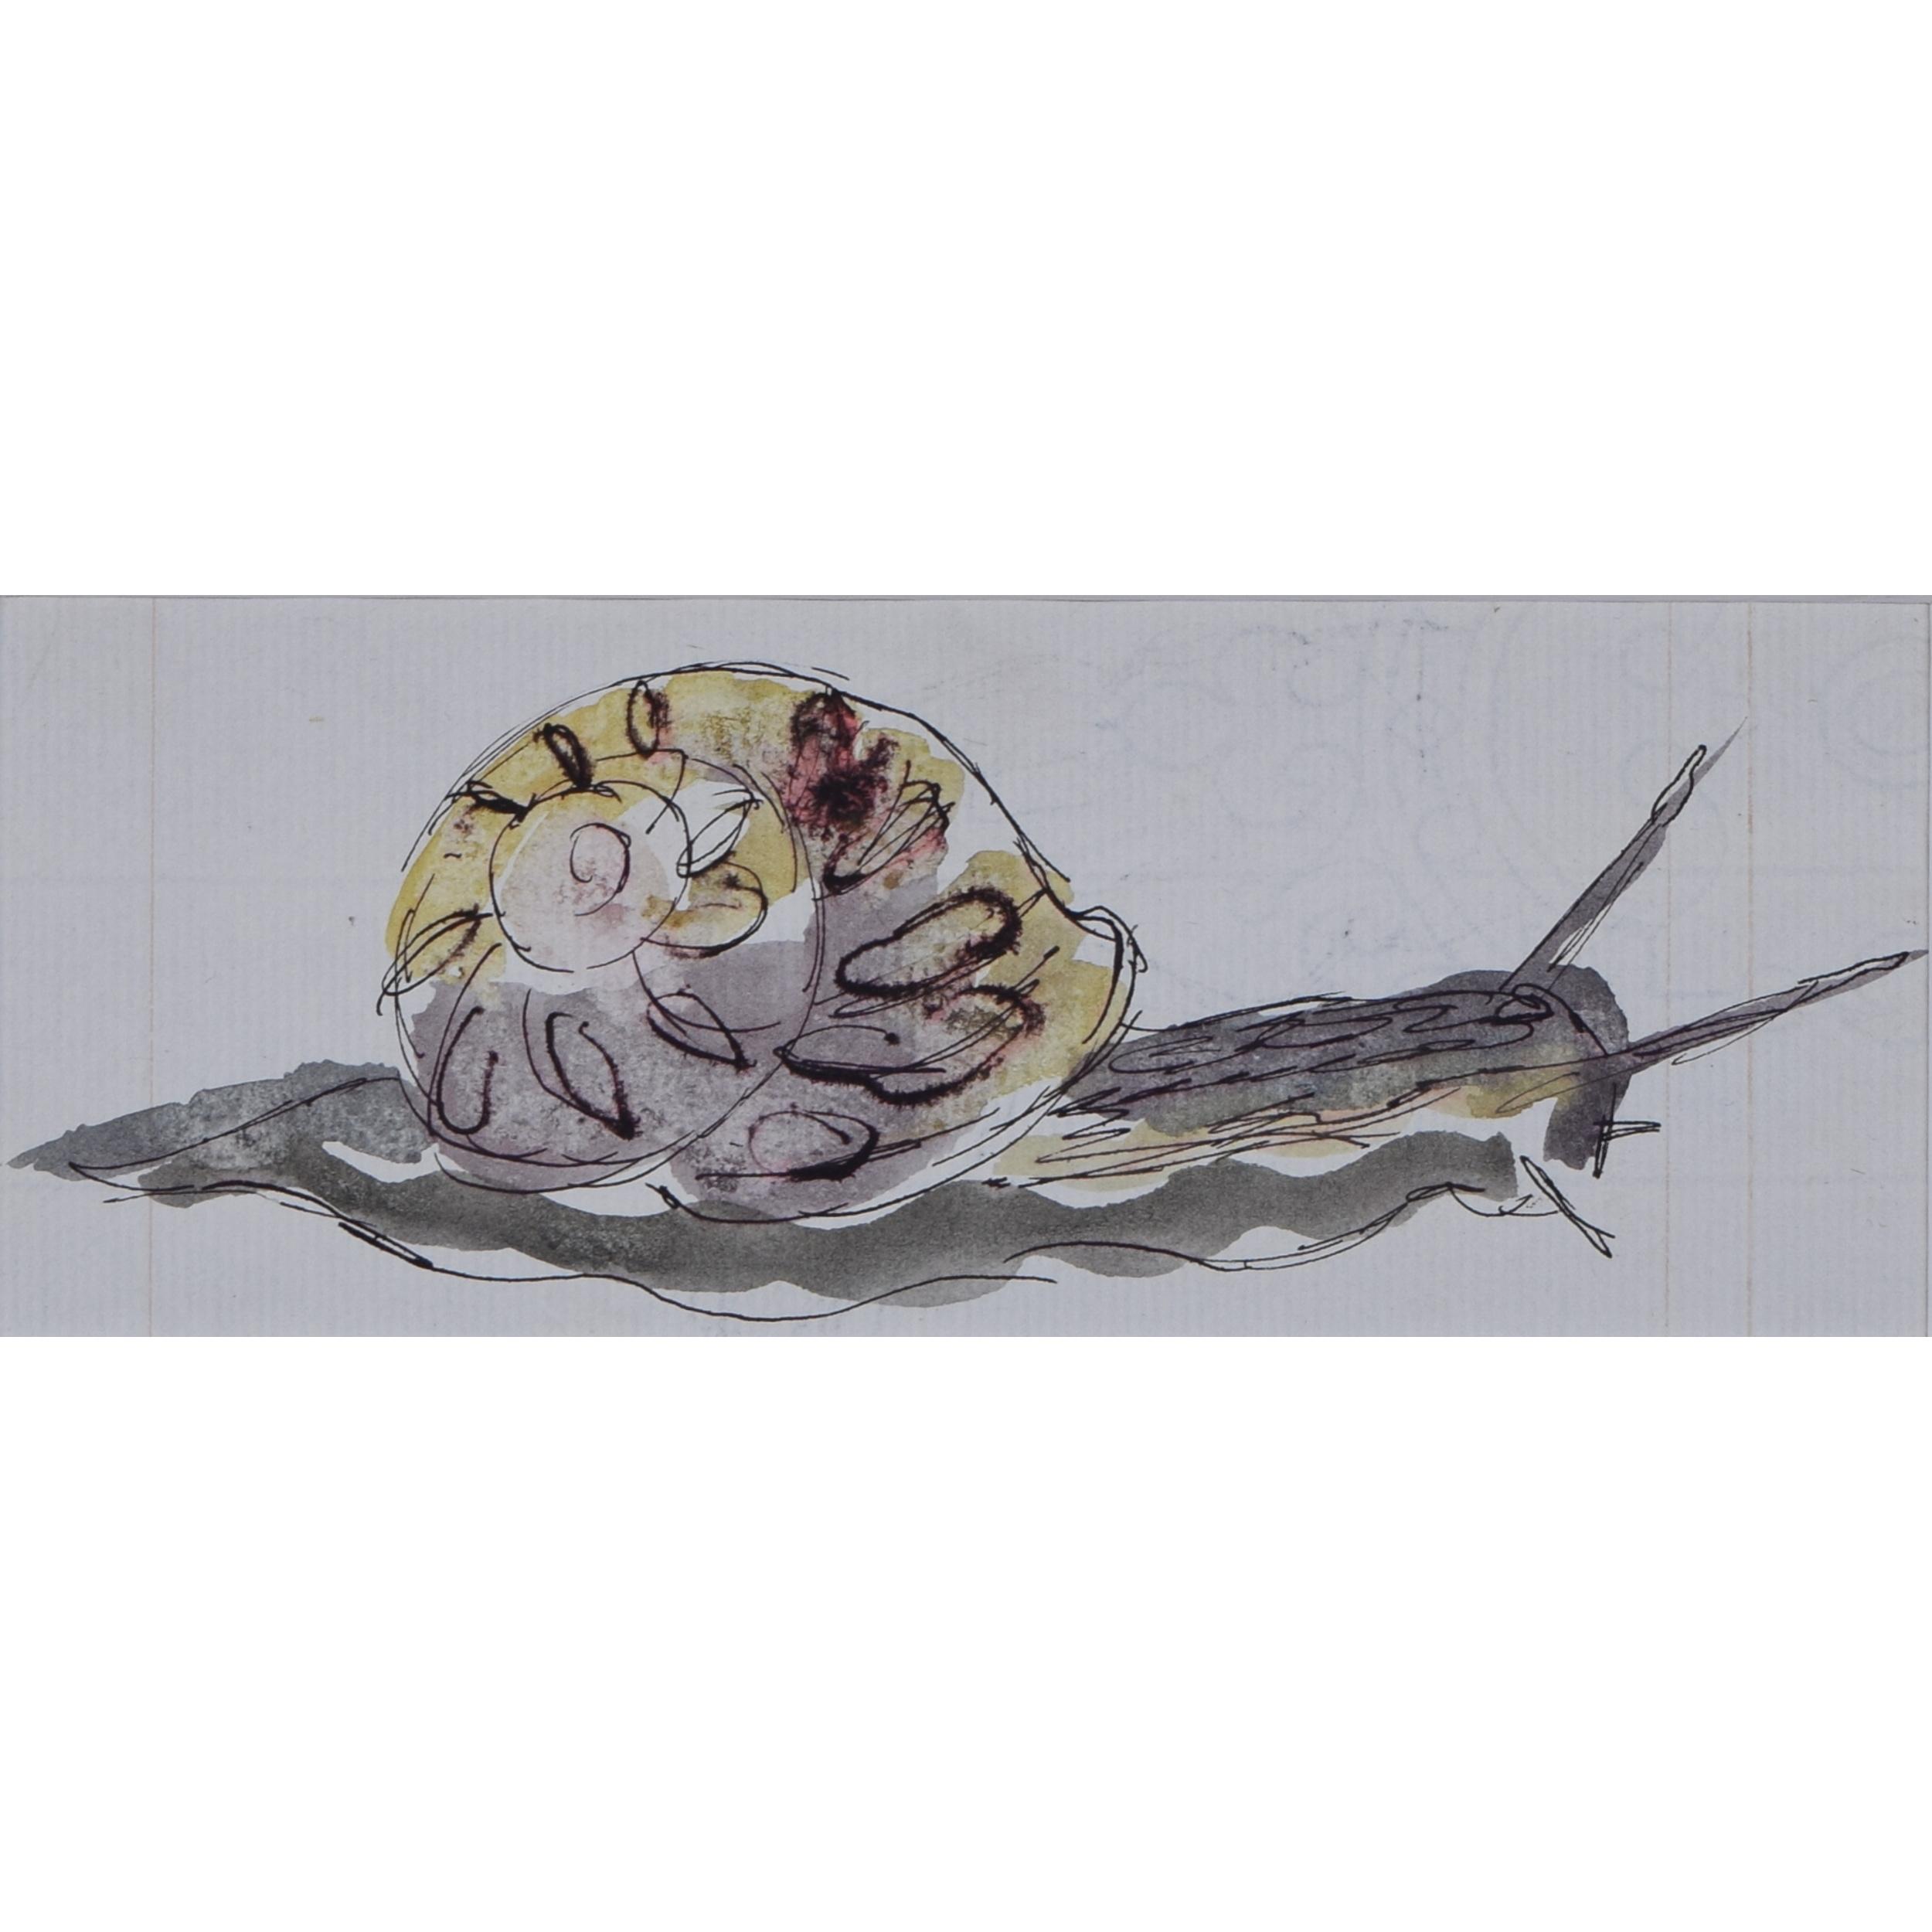 Rosemary Ellis snail iii